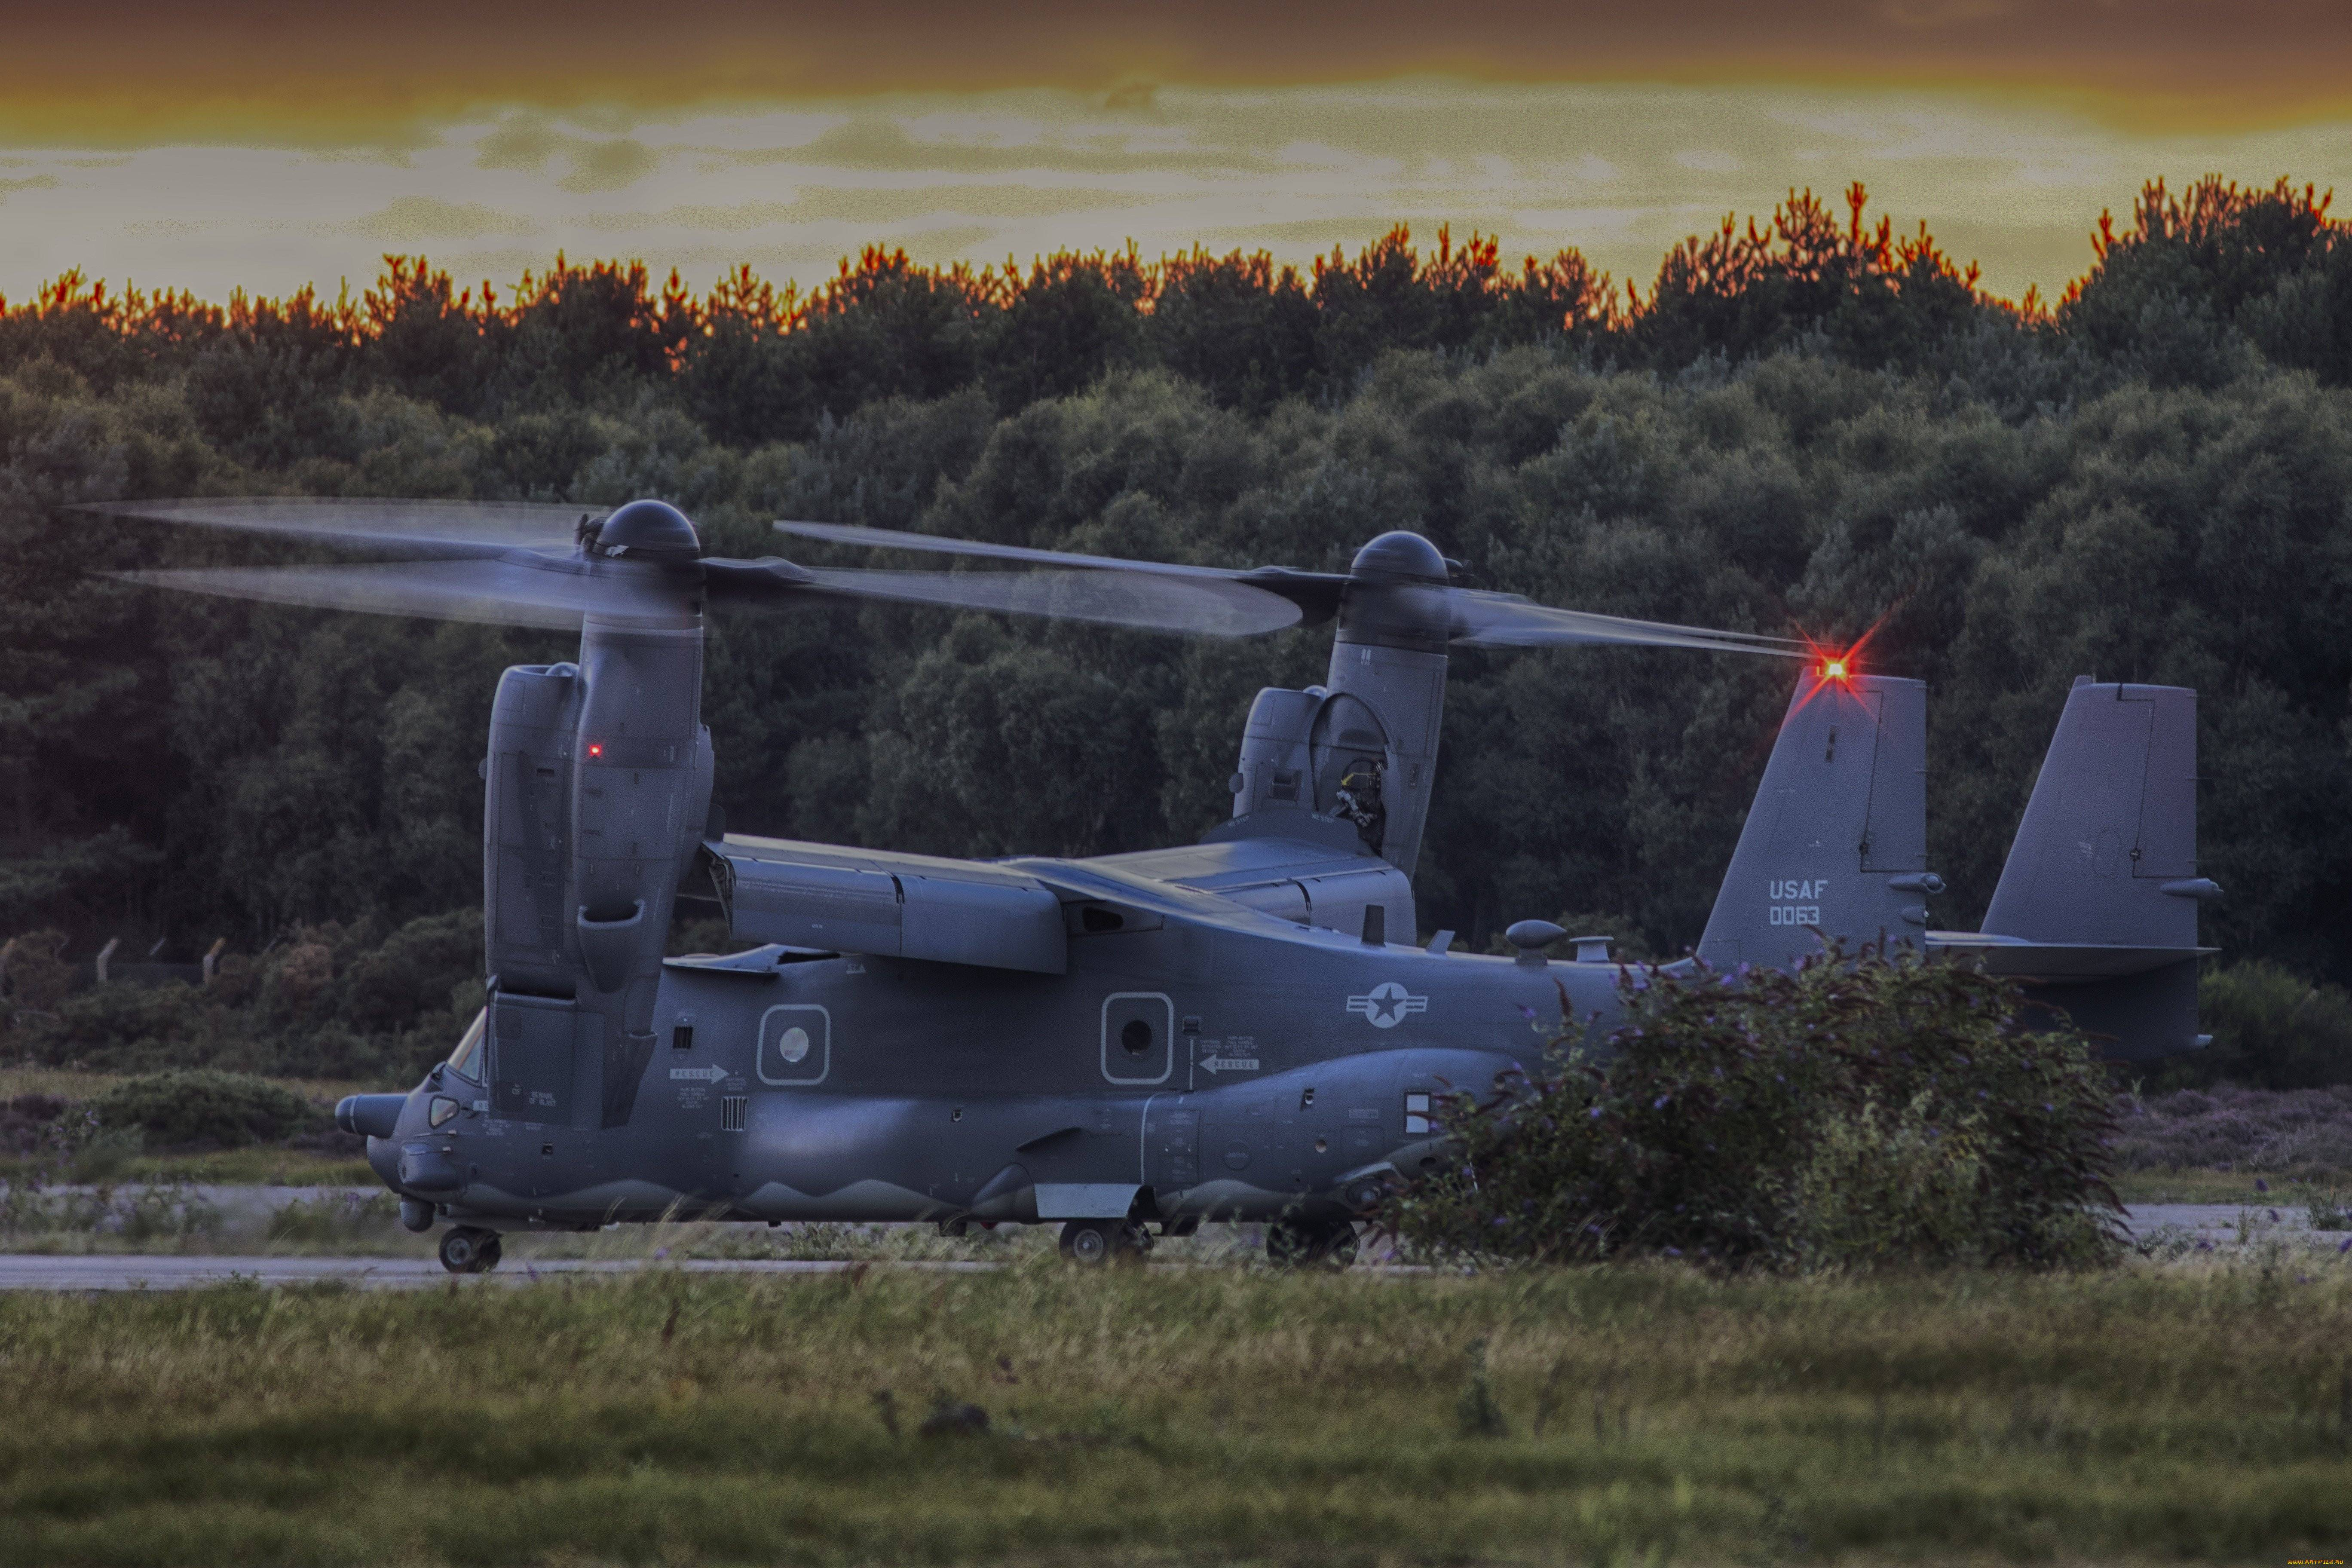 Bell boeing v-22 osprey — global wiki. wargaming.net